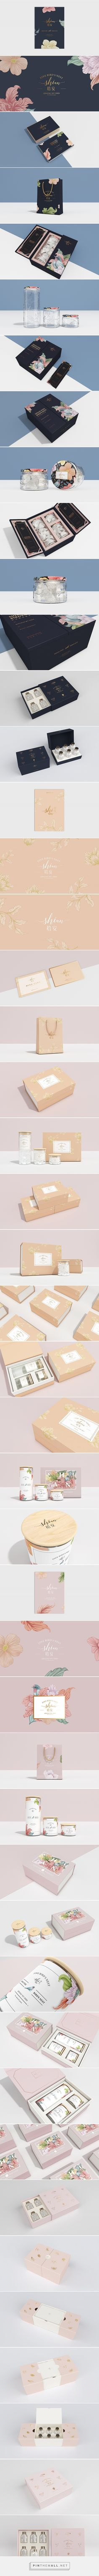 Shian Branding and Packaging by Hellocean | Logo Designer Bradenton, Web Design Sarasota, Tampa Fivestar Branding Agency